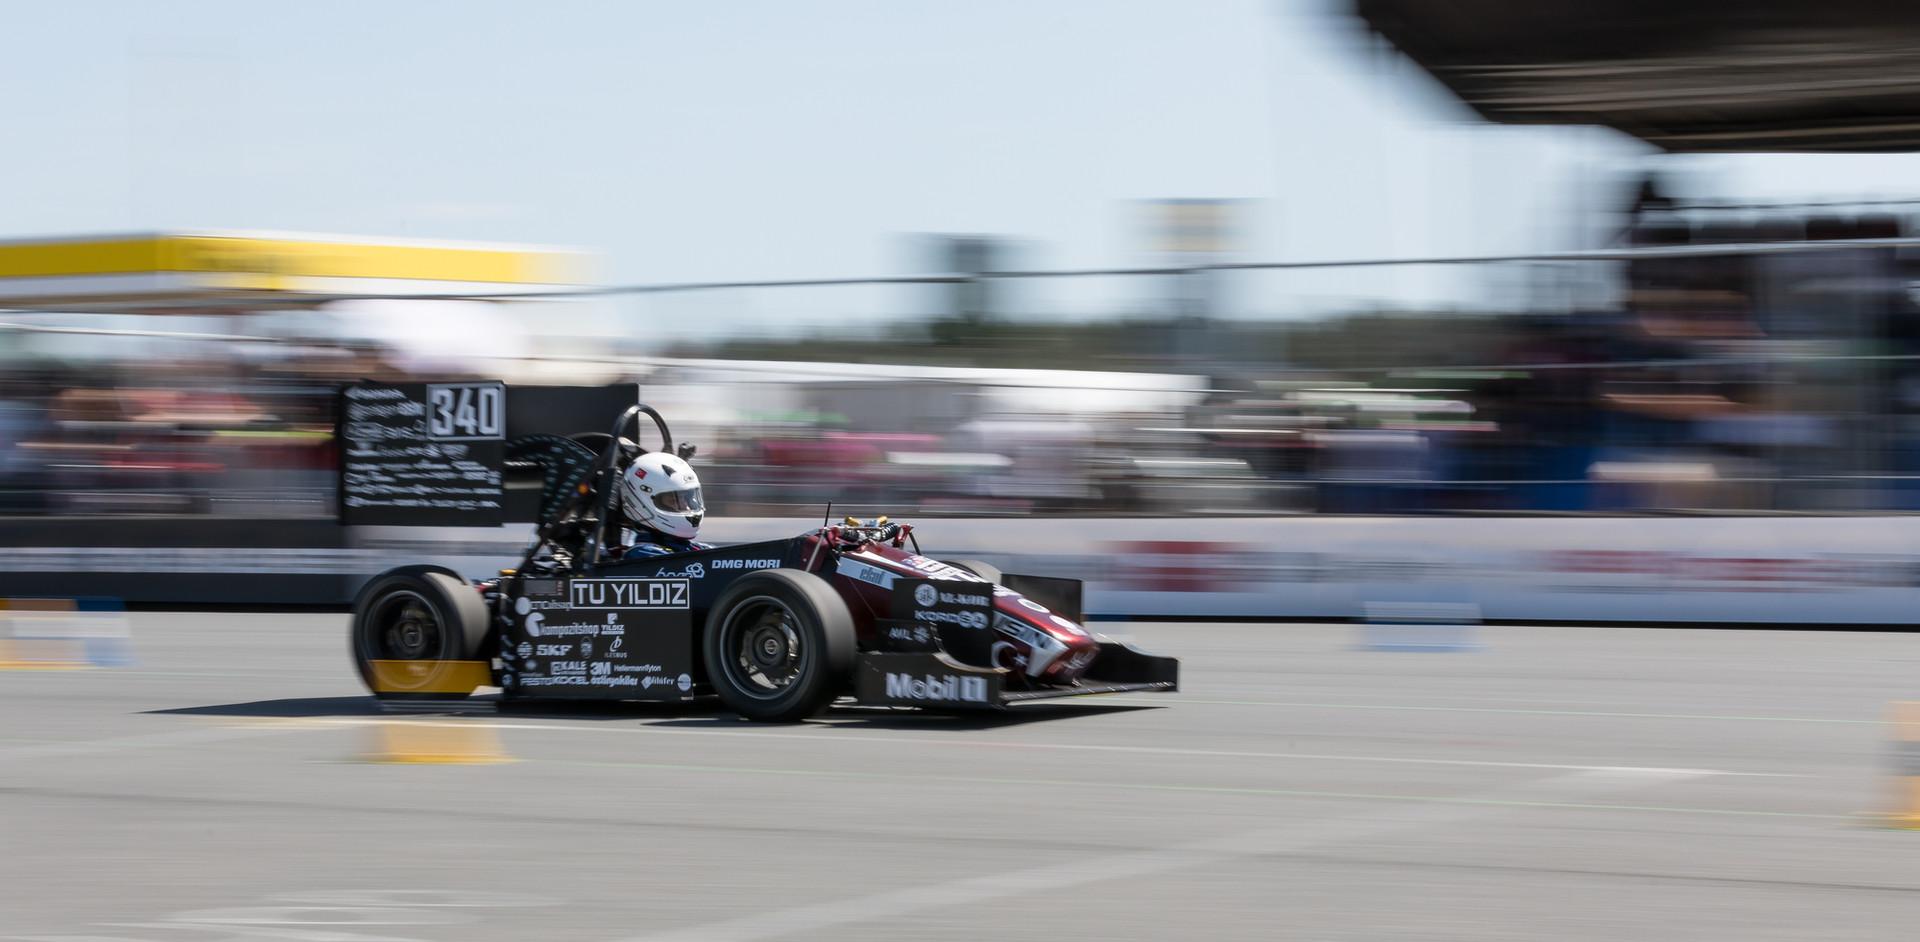 Hockenheimring F1 Circuit / Germany